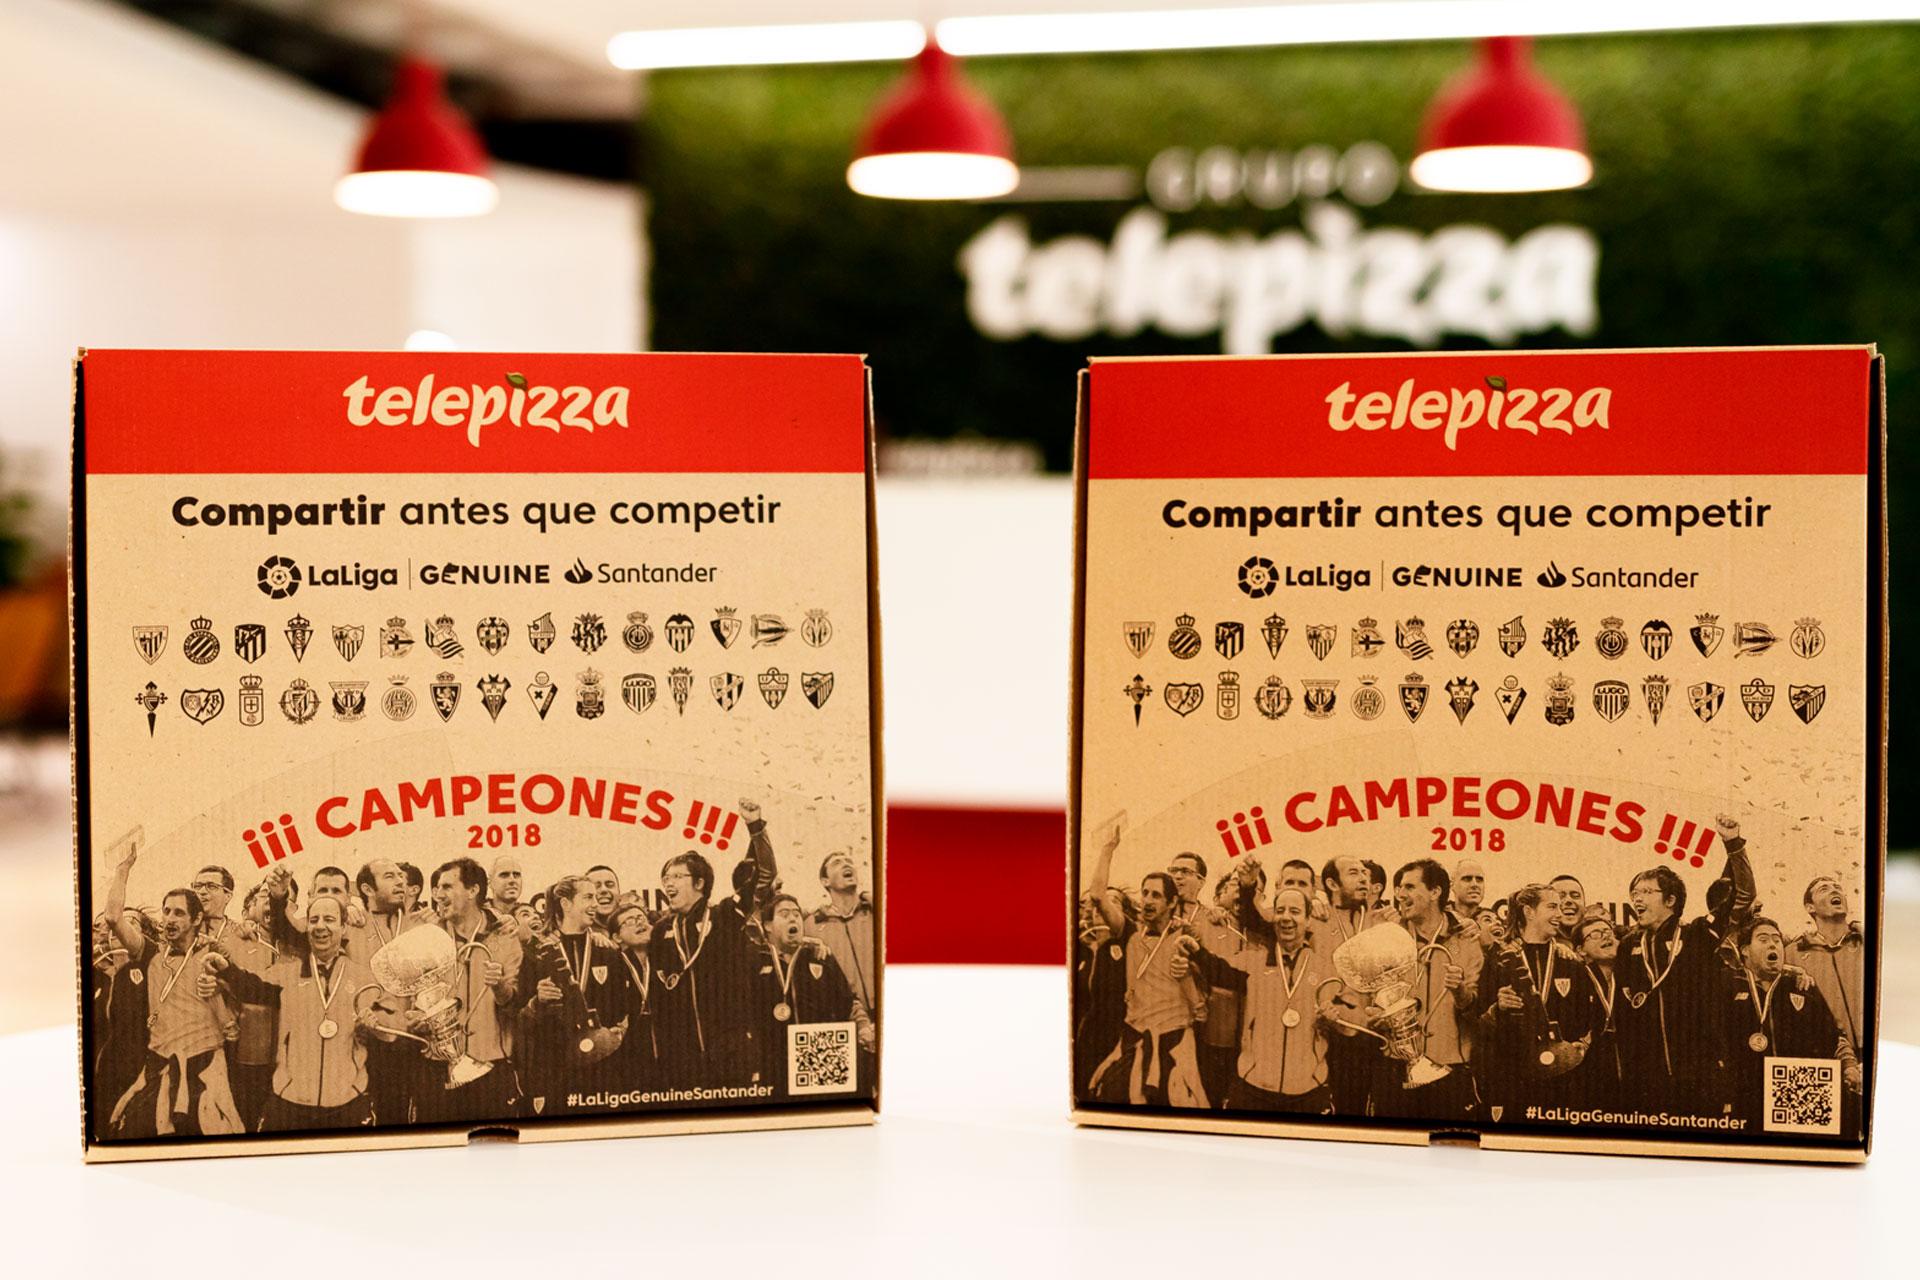 grupo-telepizza-responsabilidad-social-corporativa